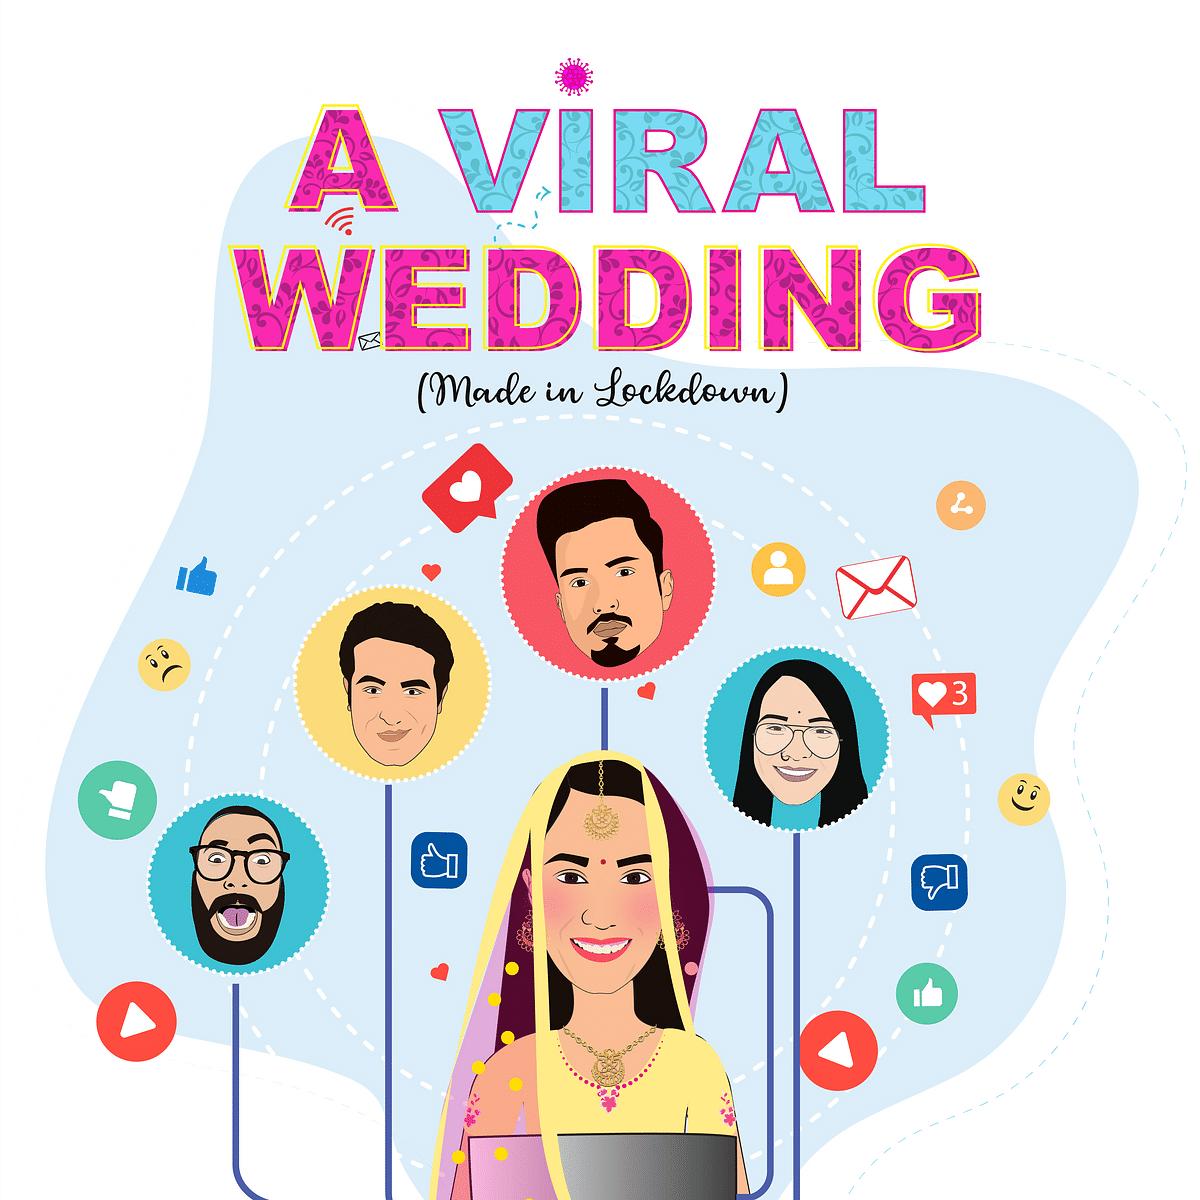 'A Viral Wedding': Made in lockdown!